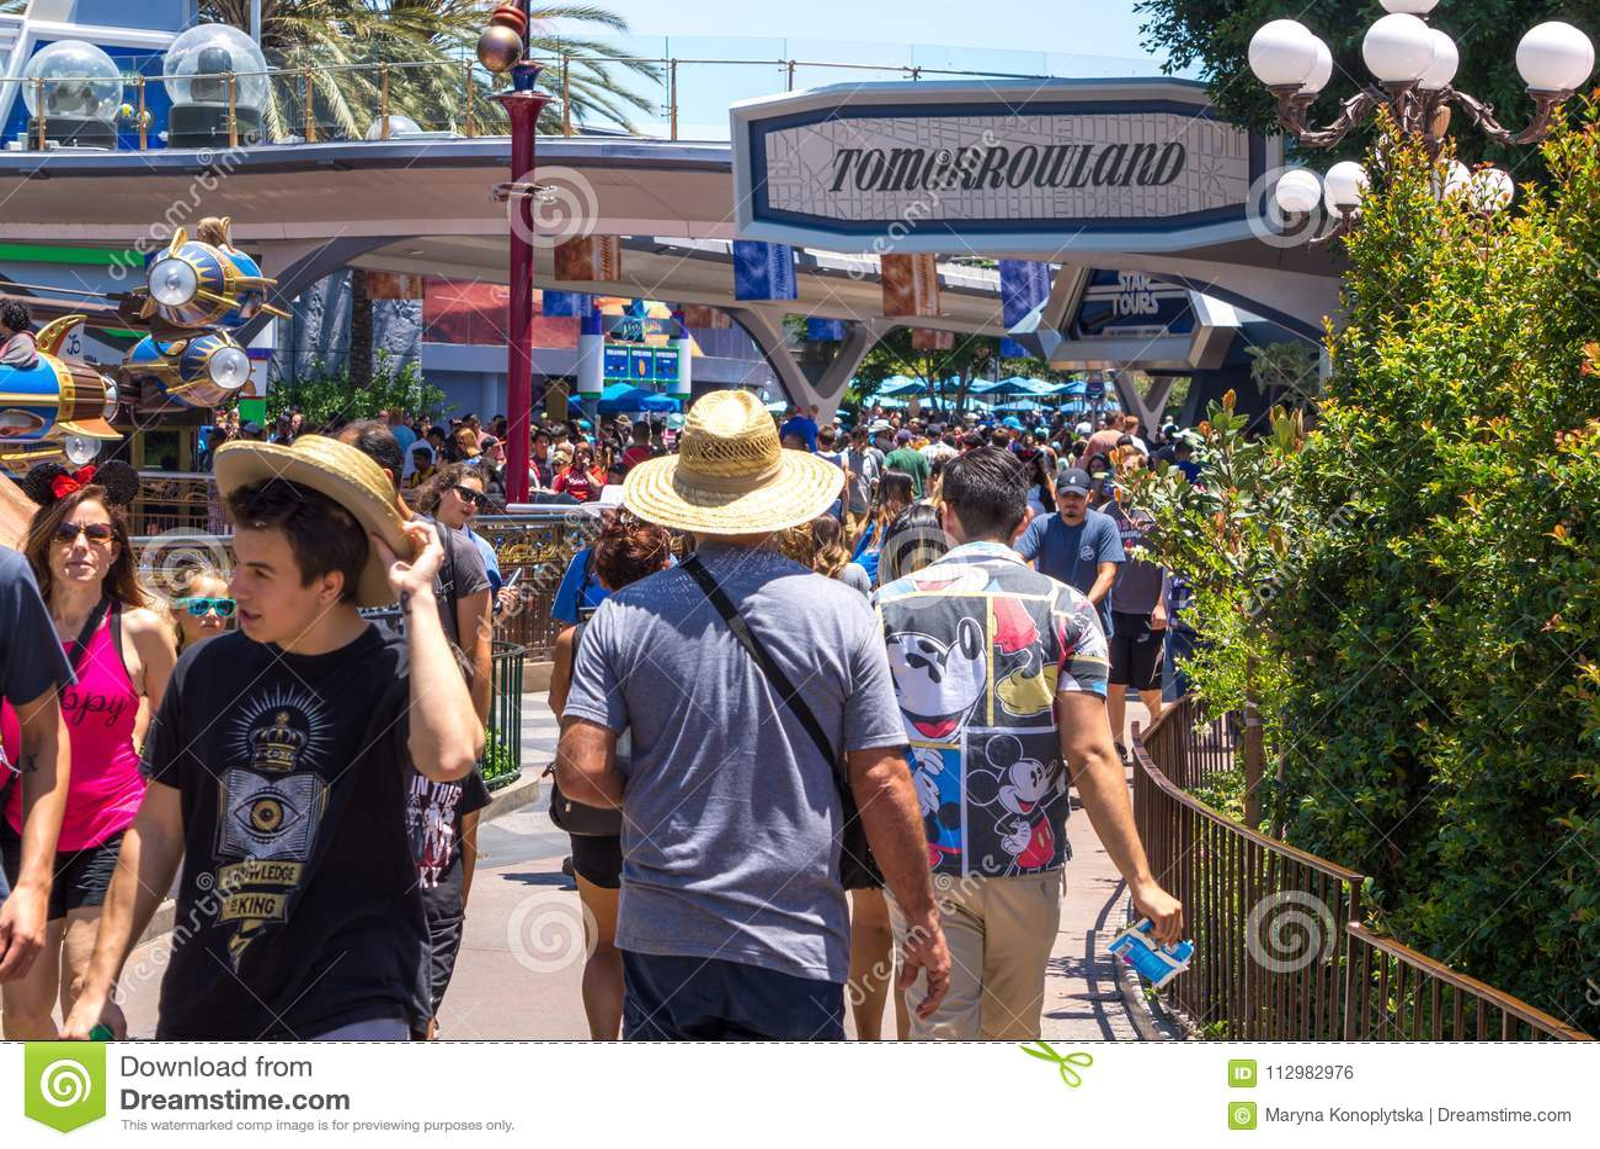 Fun at Disneyland Park in Anaheim, California, USA. Los Angeles Tourist Attractions